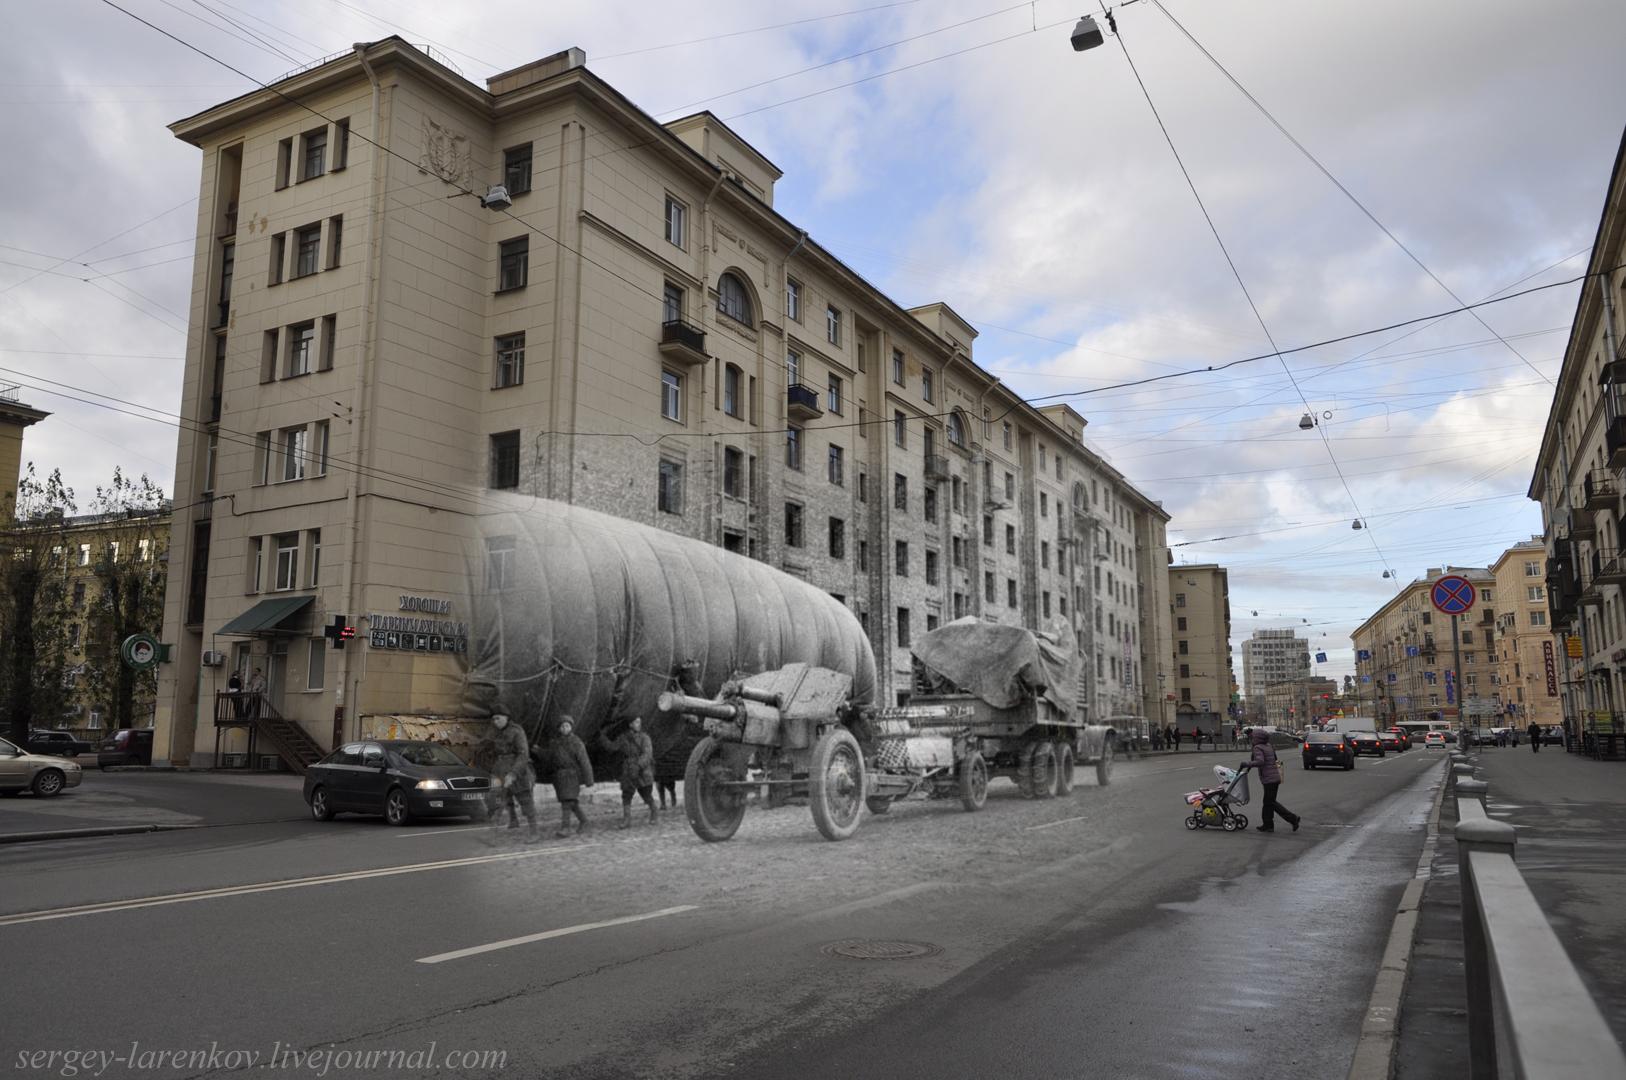 Ленинград 1944-Санкт-Петербург 2013 Ул. Бабушкина. Тяжелая артиллерия выдвигается на позиции